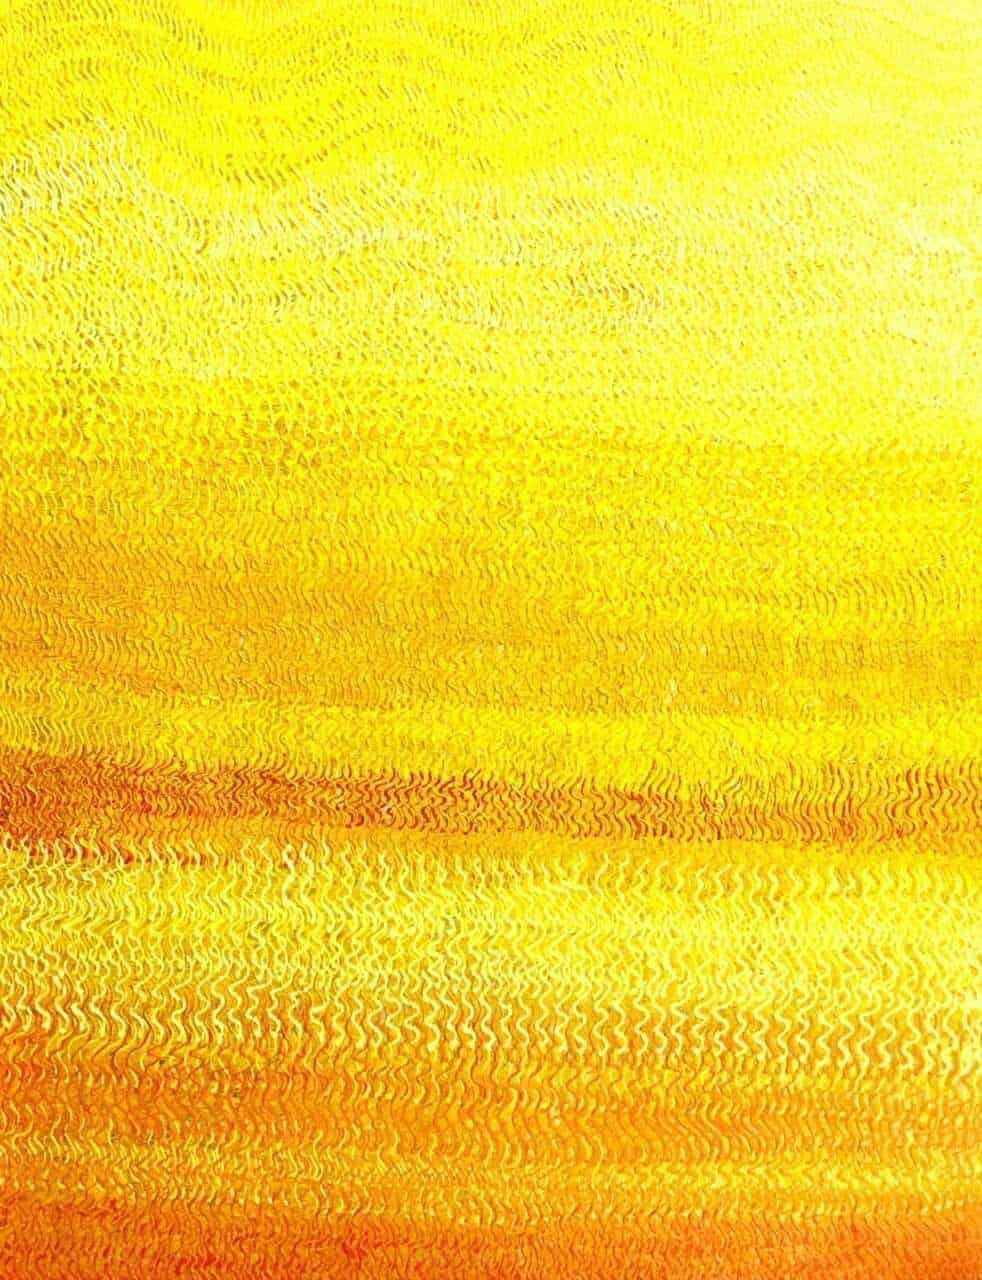 2016-30_(sold)_Golden-Sea-1_180x140cm_Acrylic-on-linen